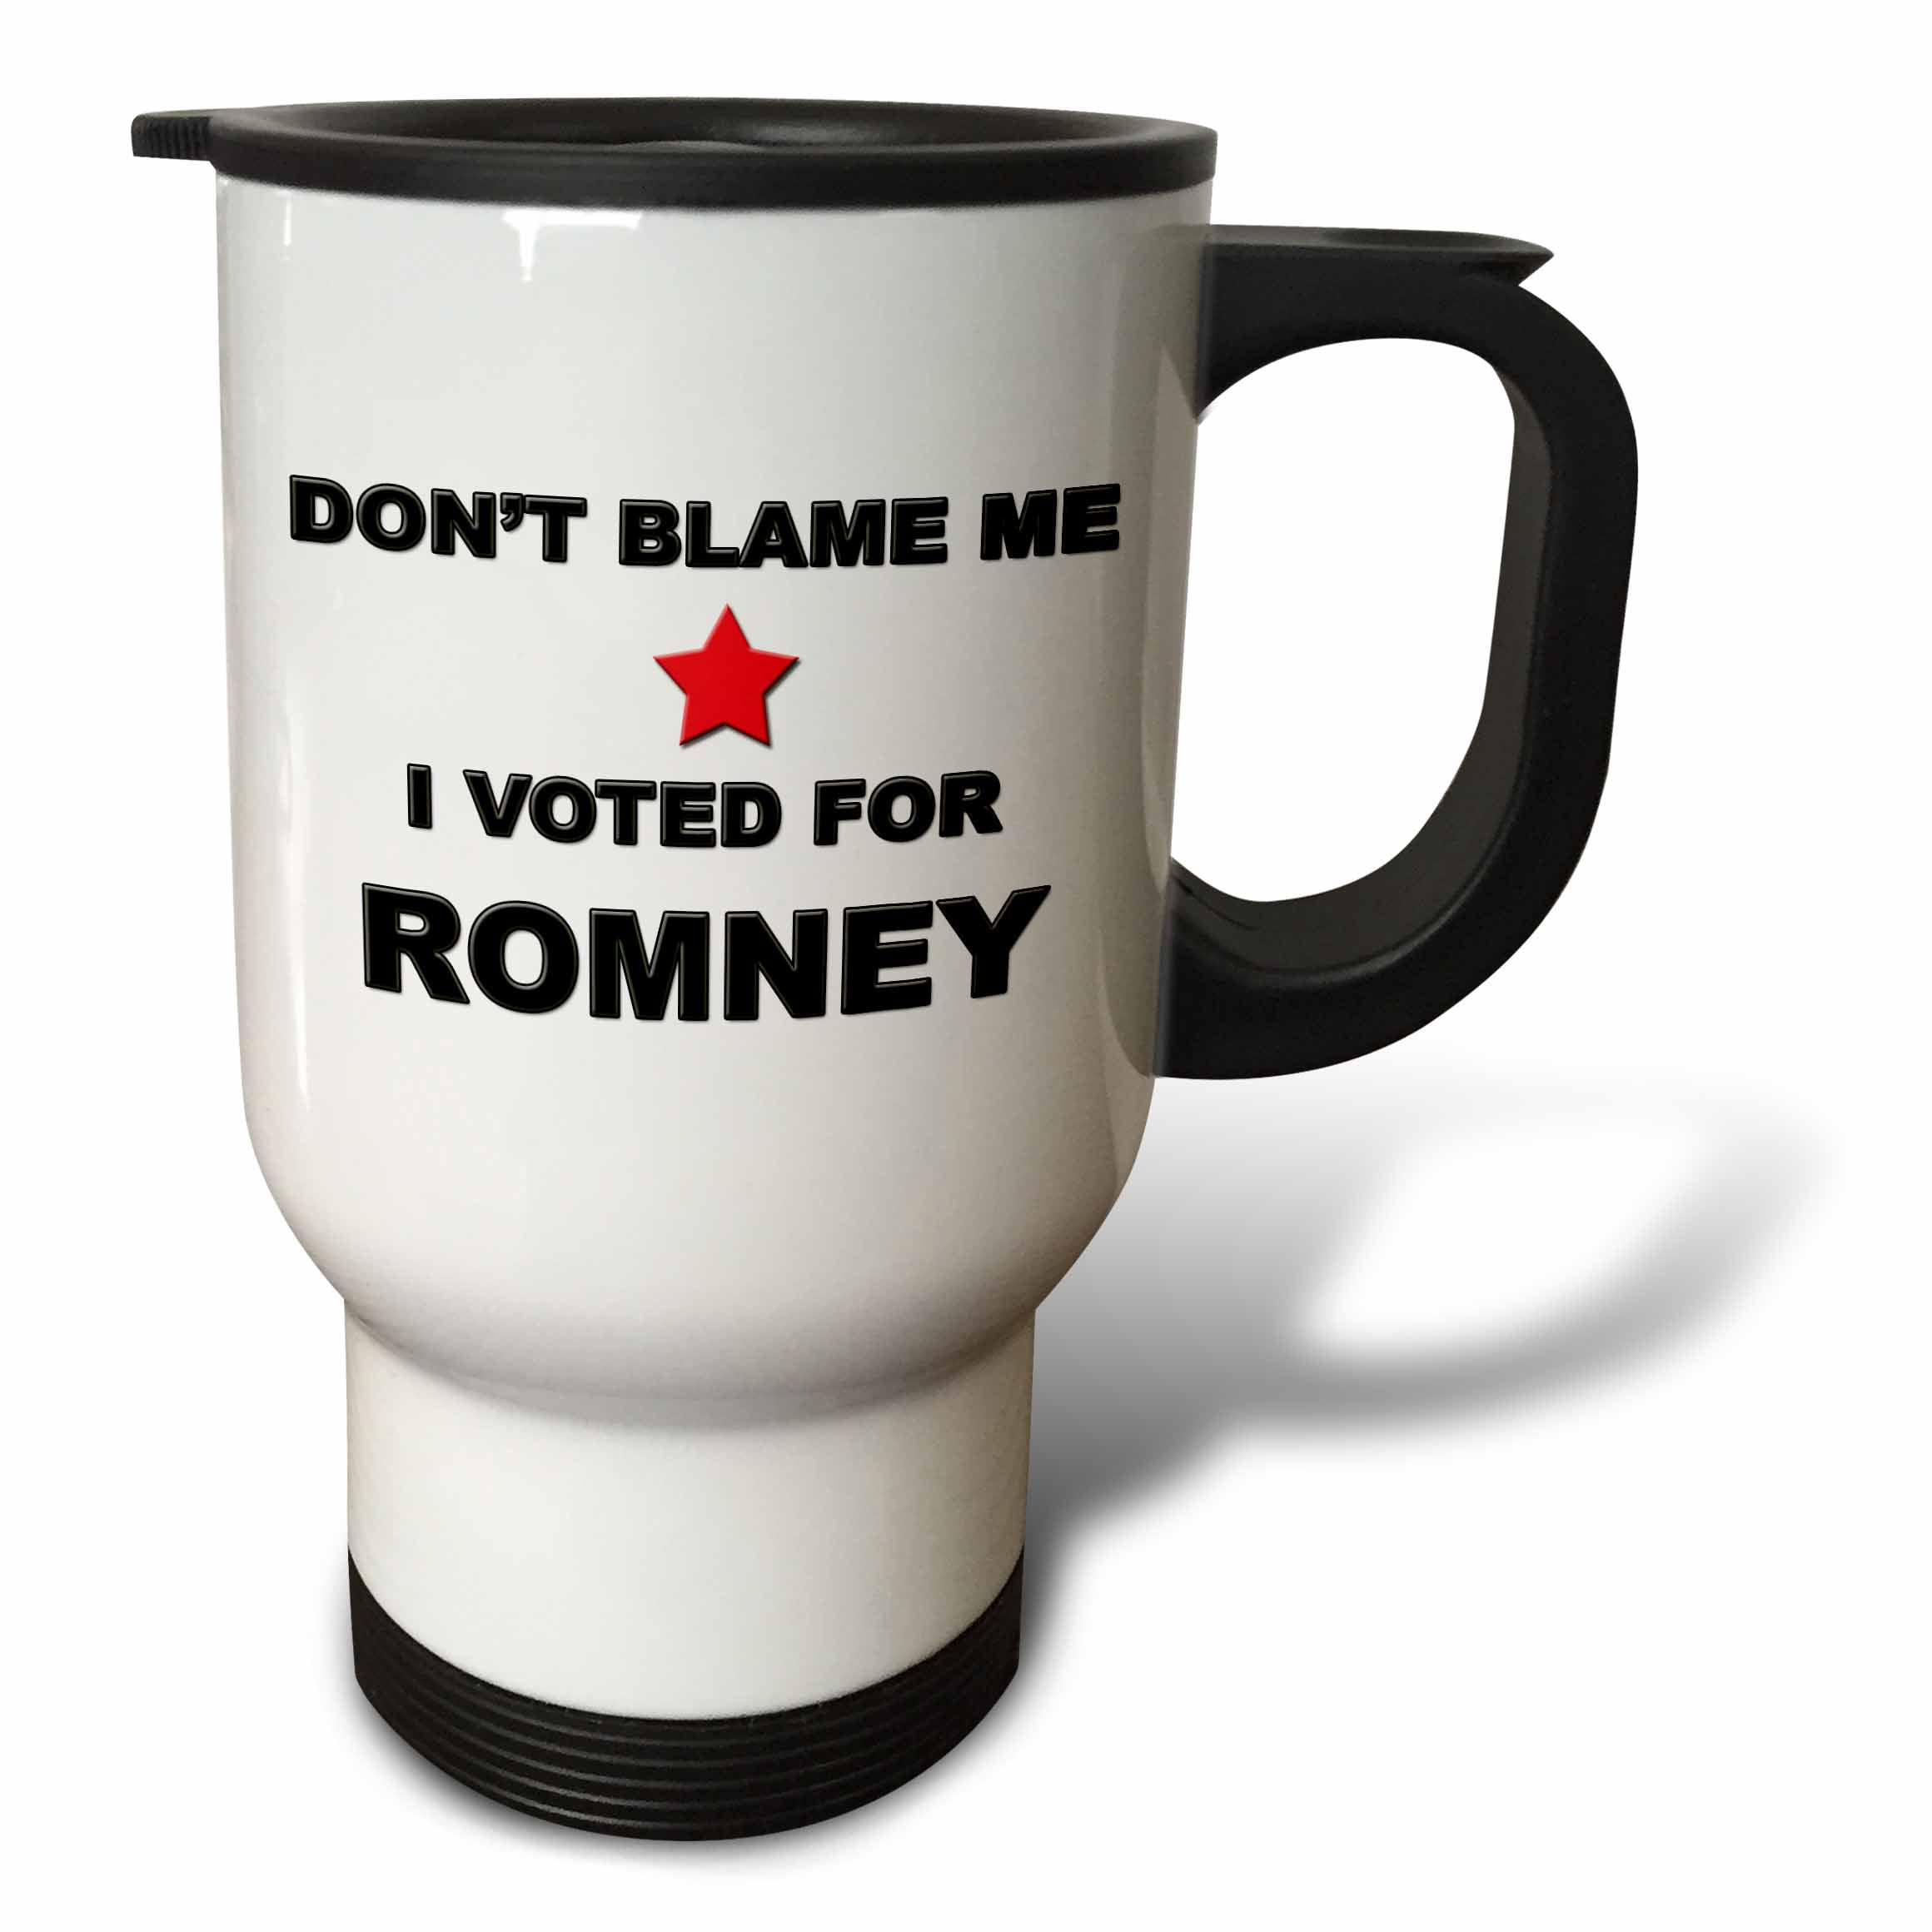 3dRose Don?t blame me I voted for Romney, Travel Mug, 14oz, Stainless Steel